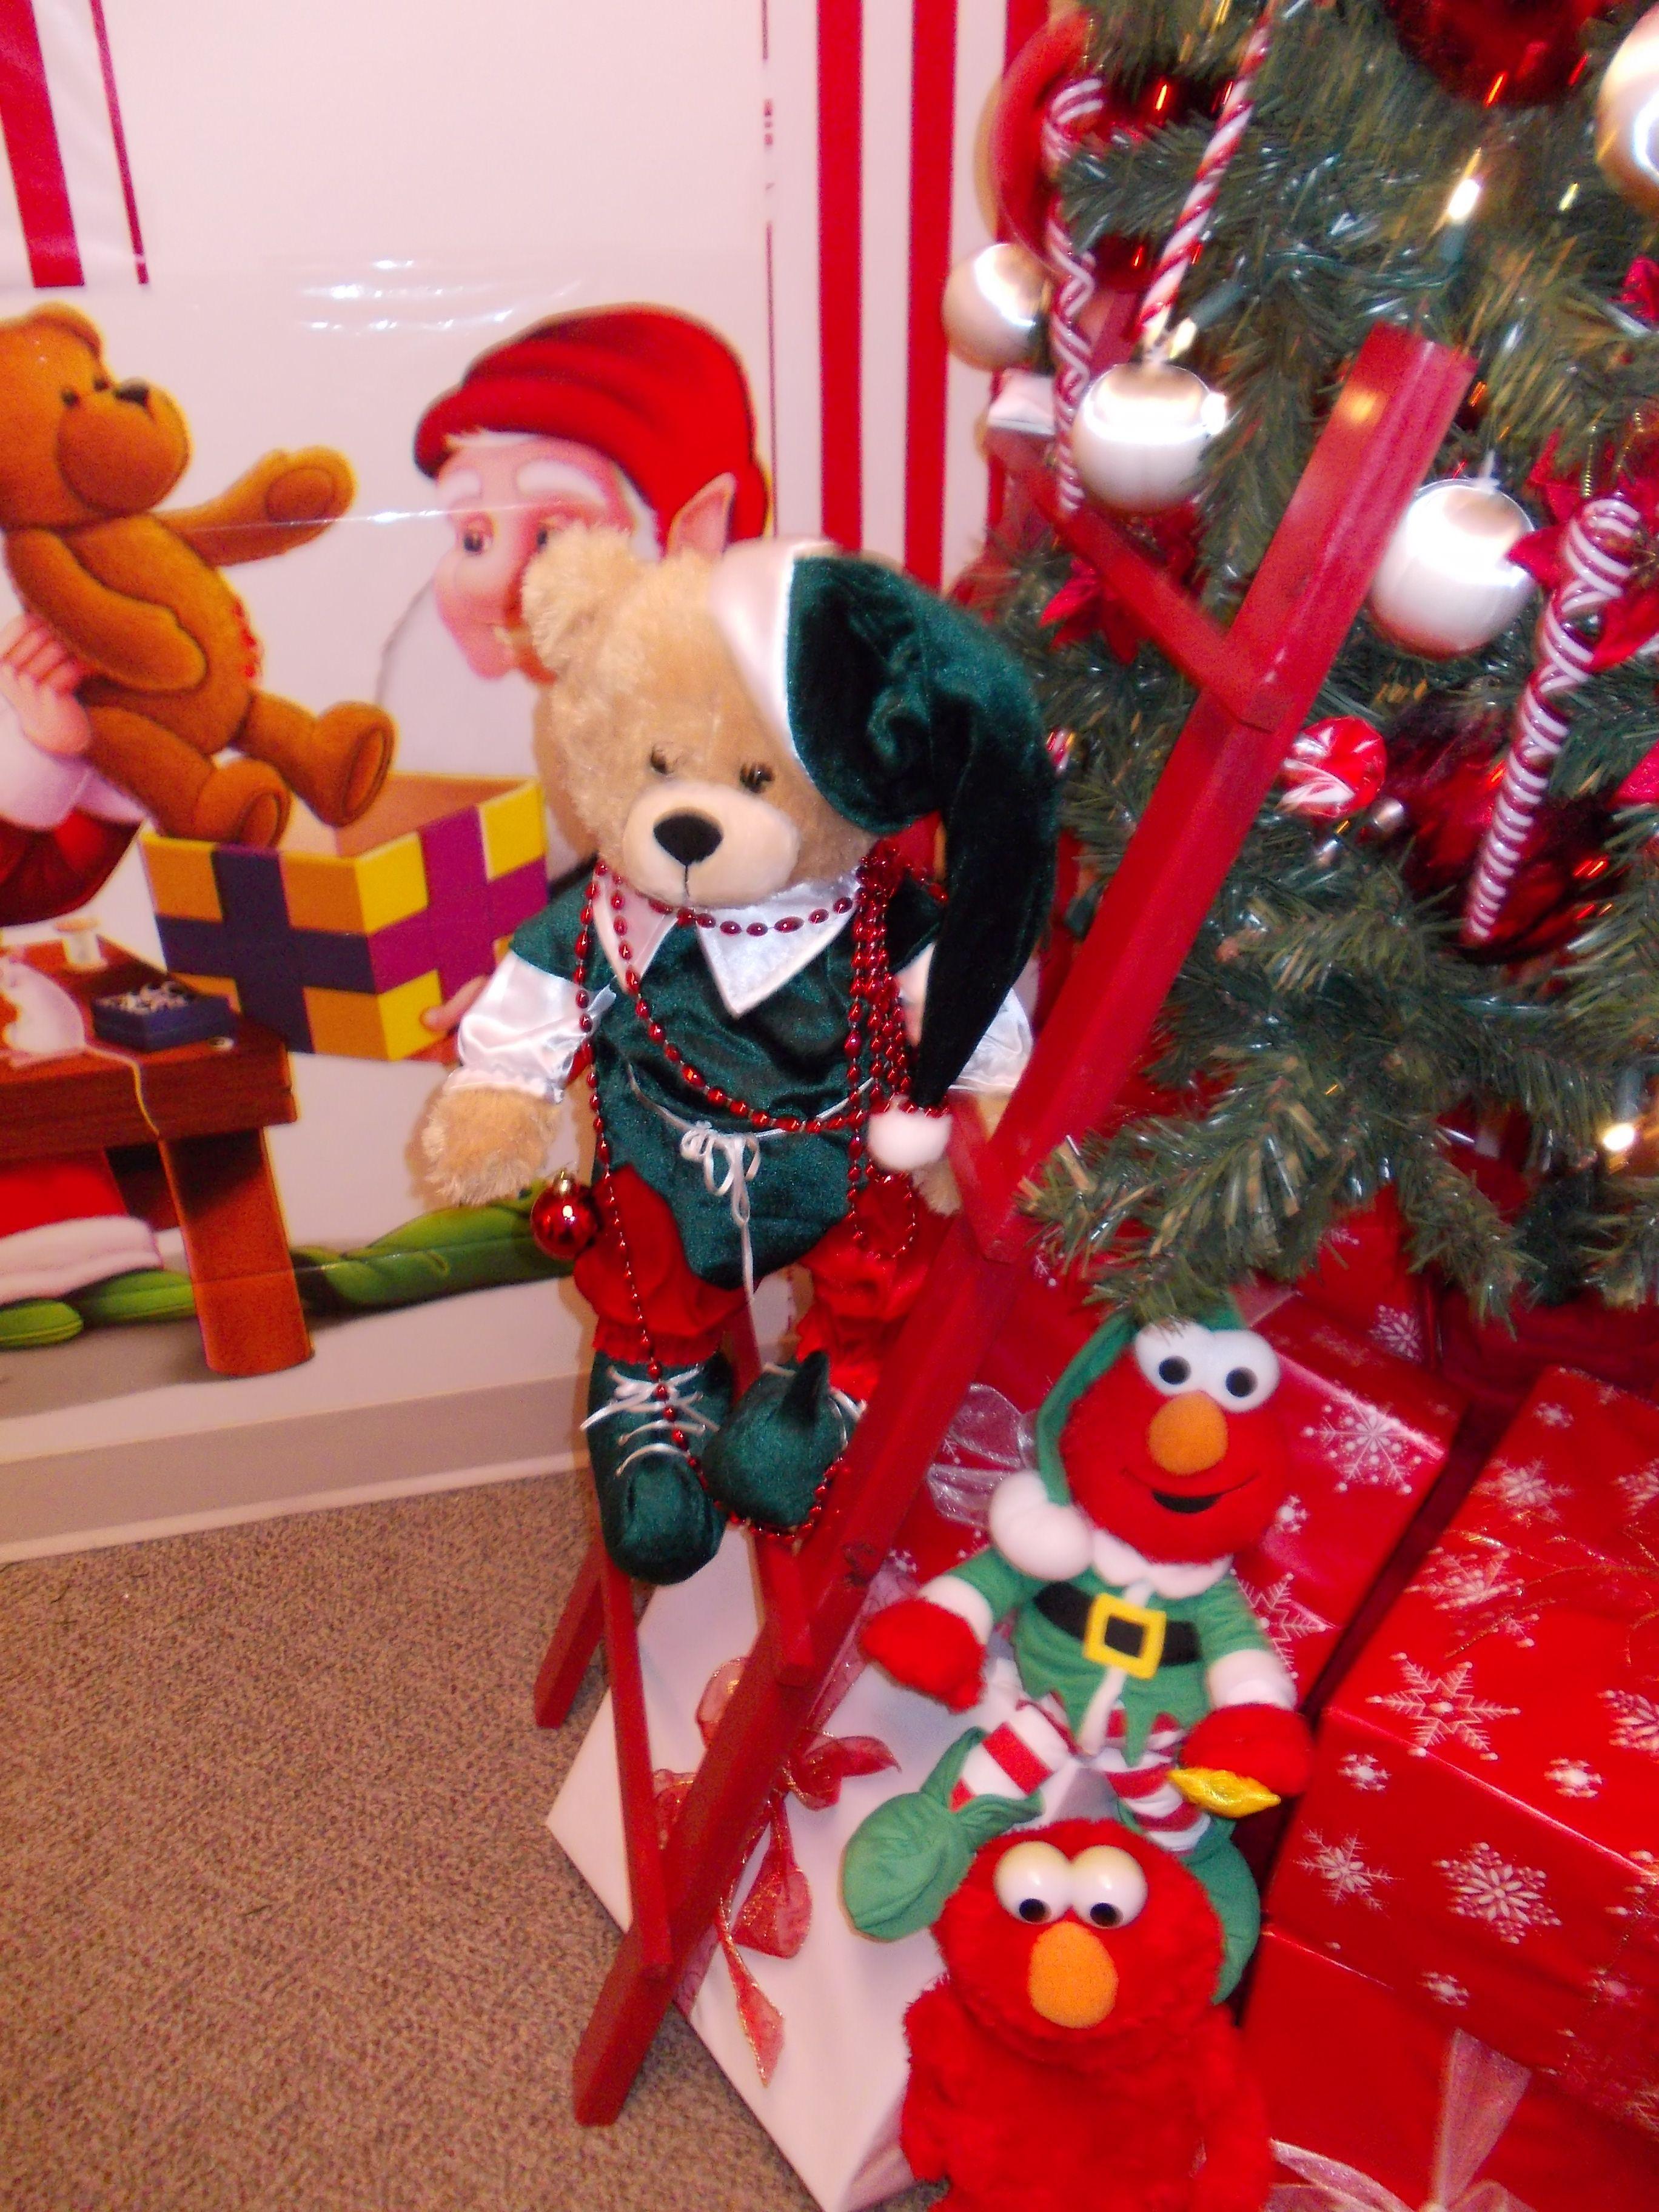 The Office Christmas Ornaments 2013 Santau0027S Workshop (Elf Helping Me